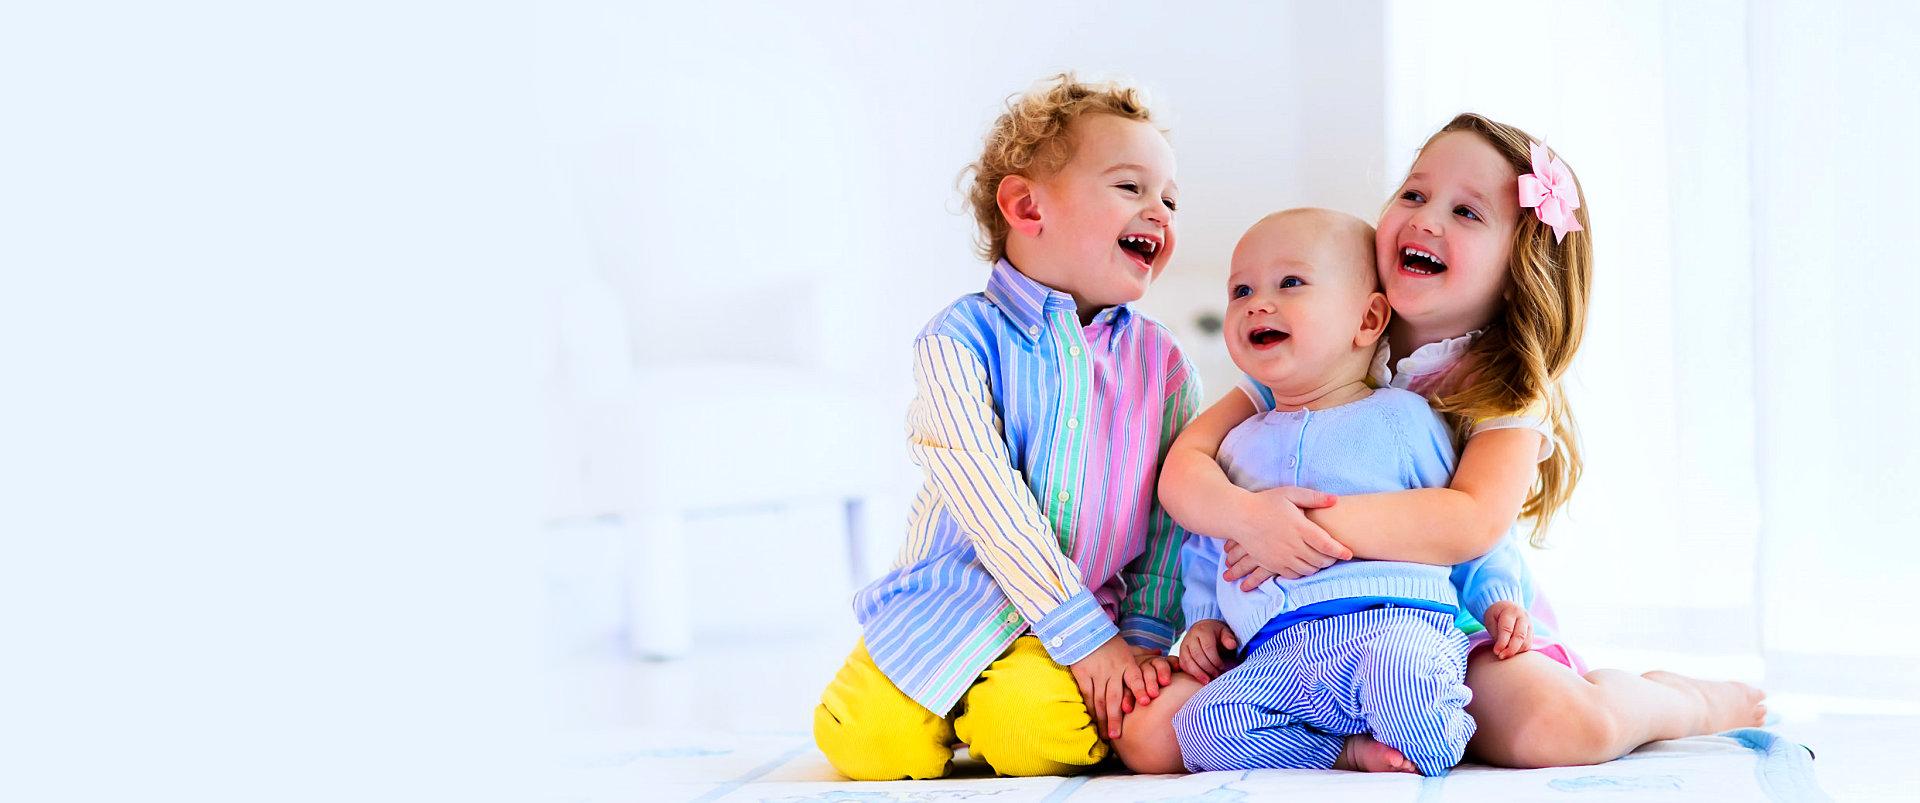 group of infants having fun